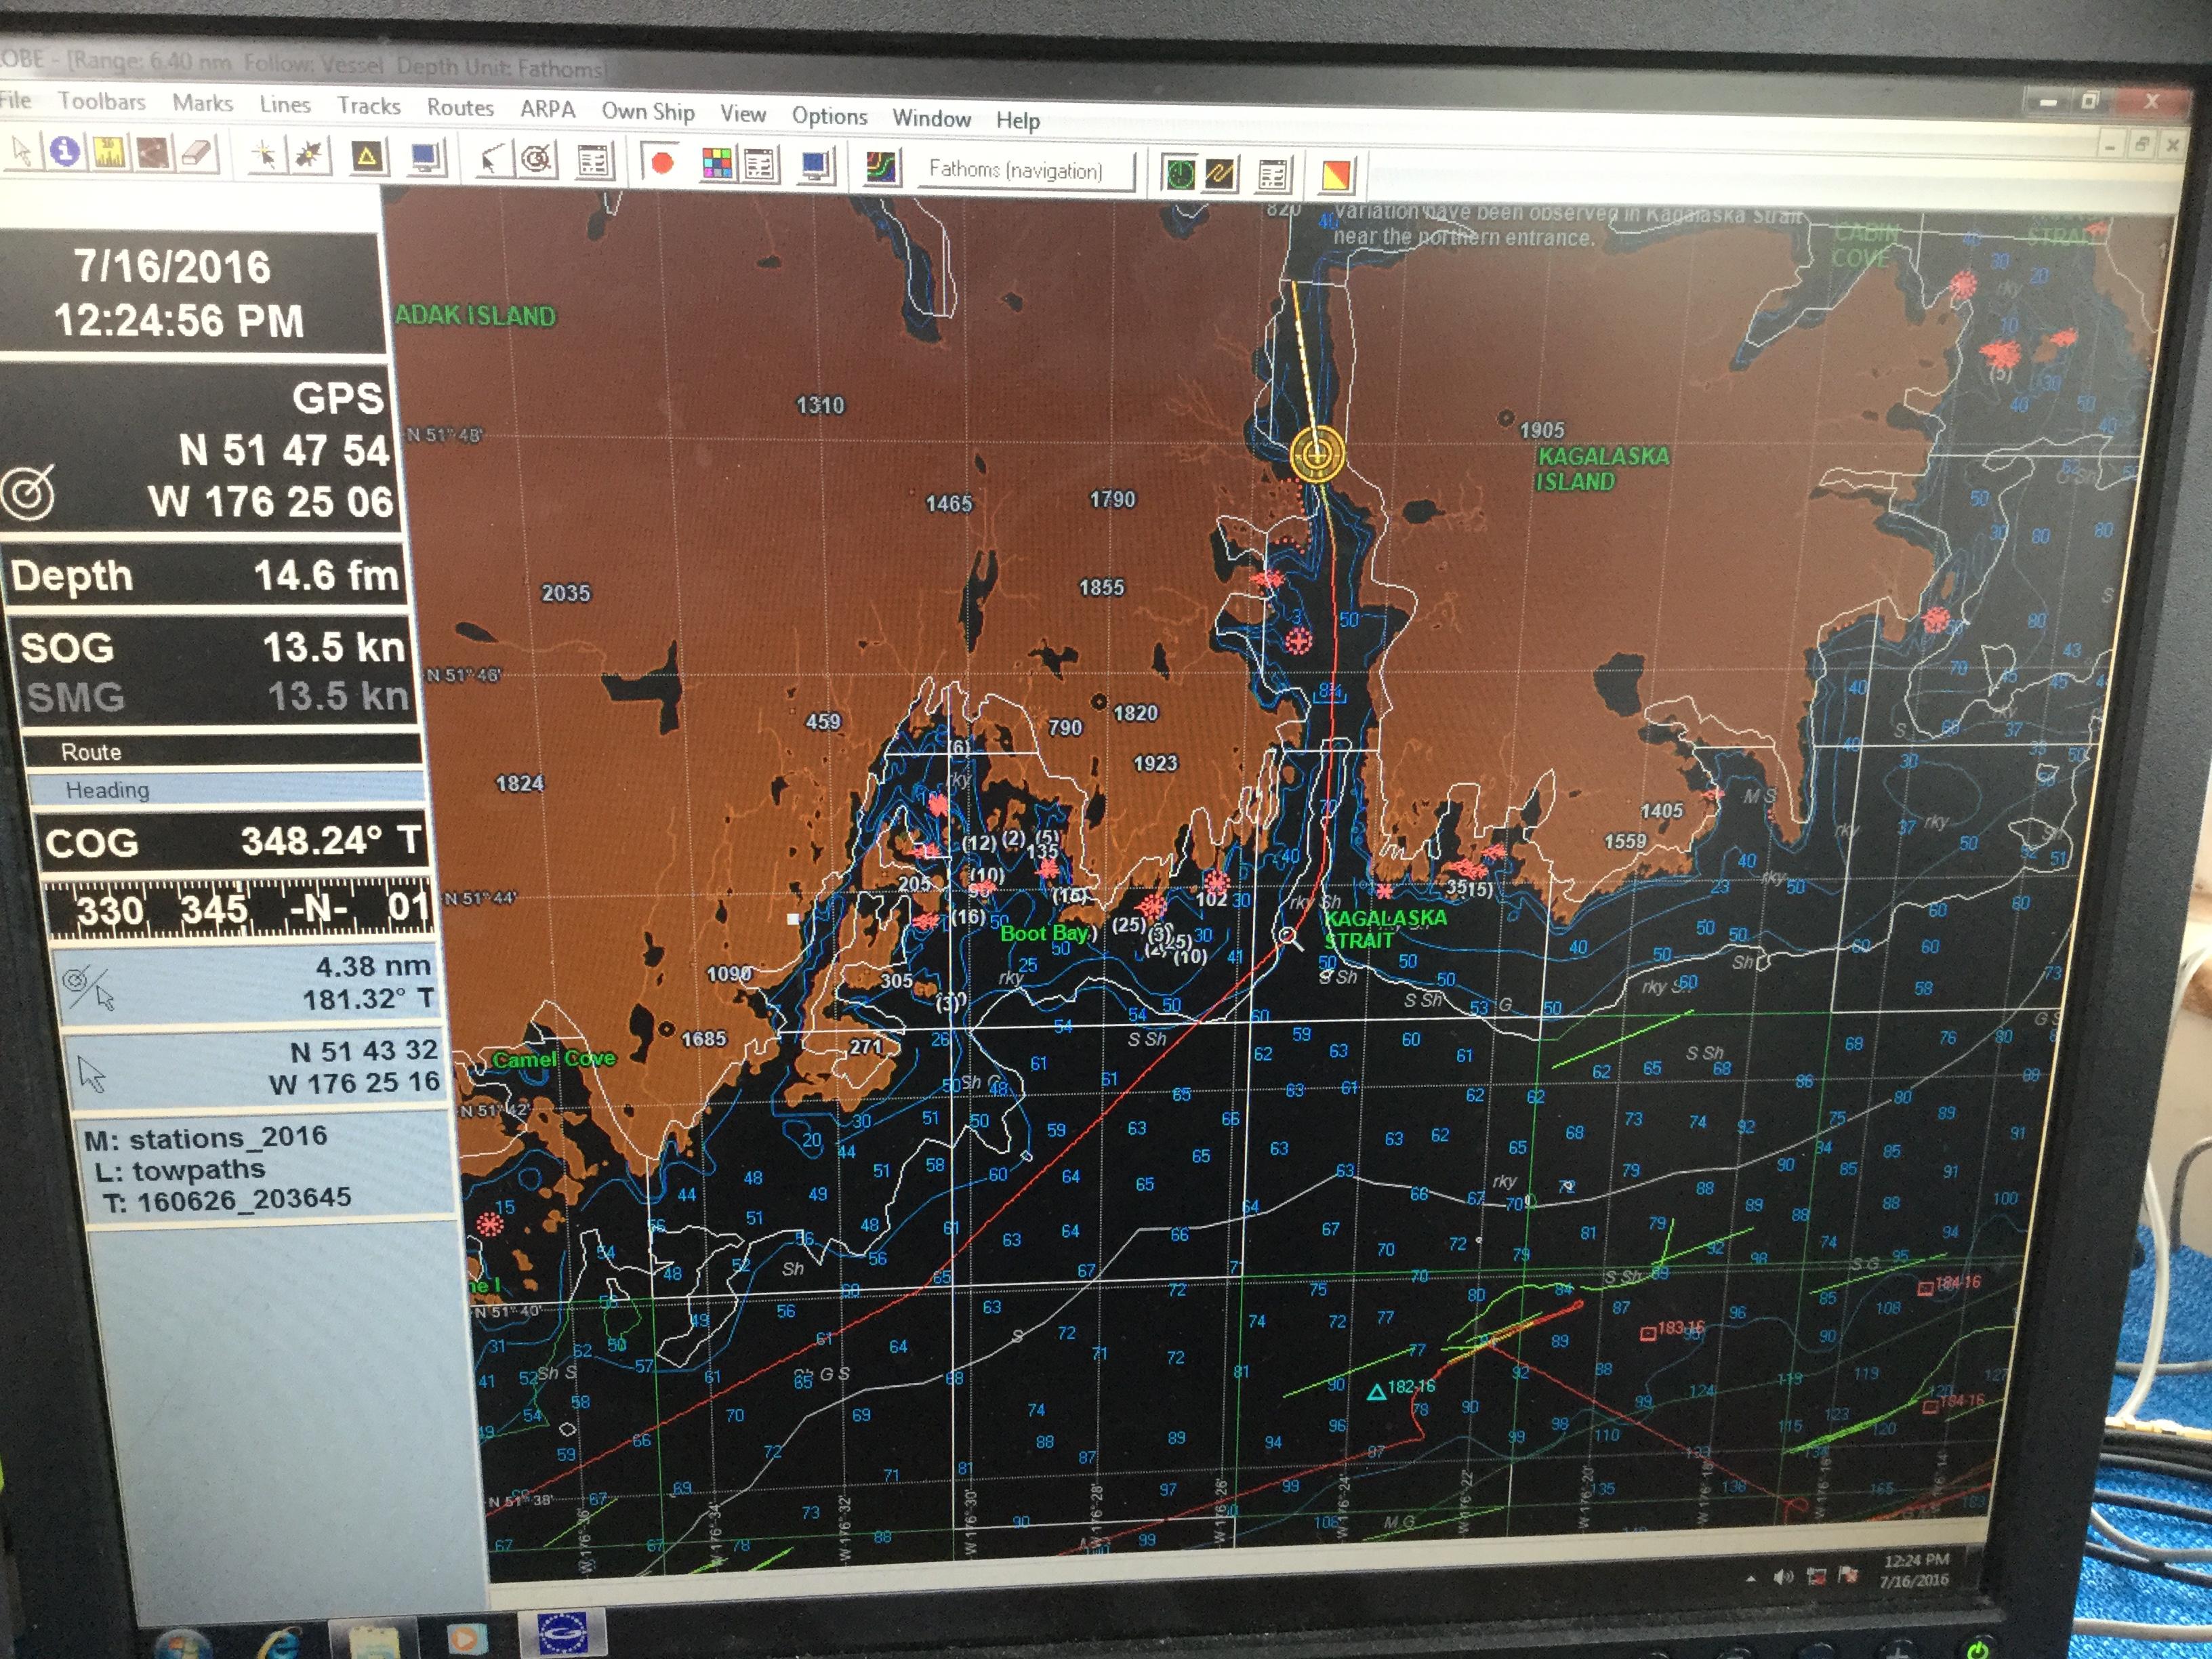 Photo of a laptop monitor navigational map display of the Kagalaska Strait.